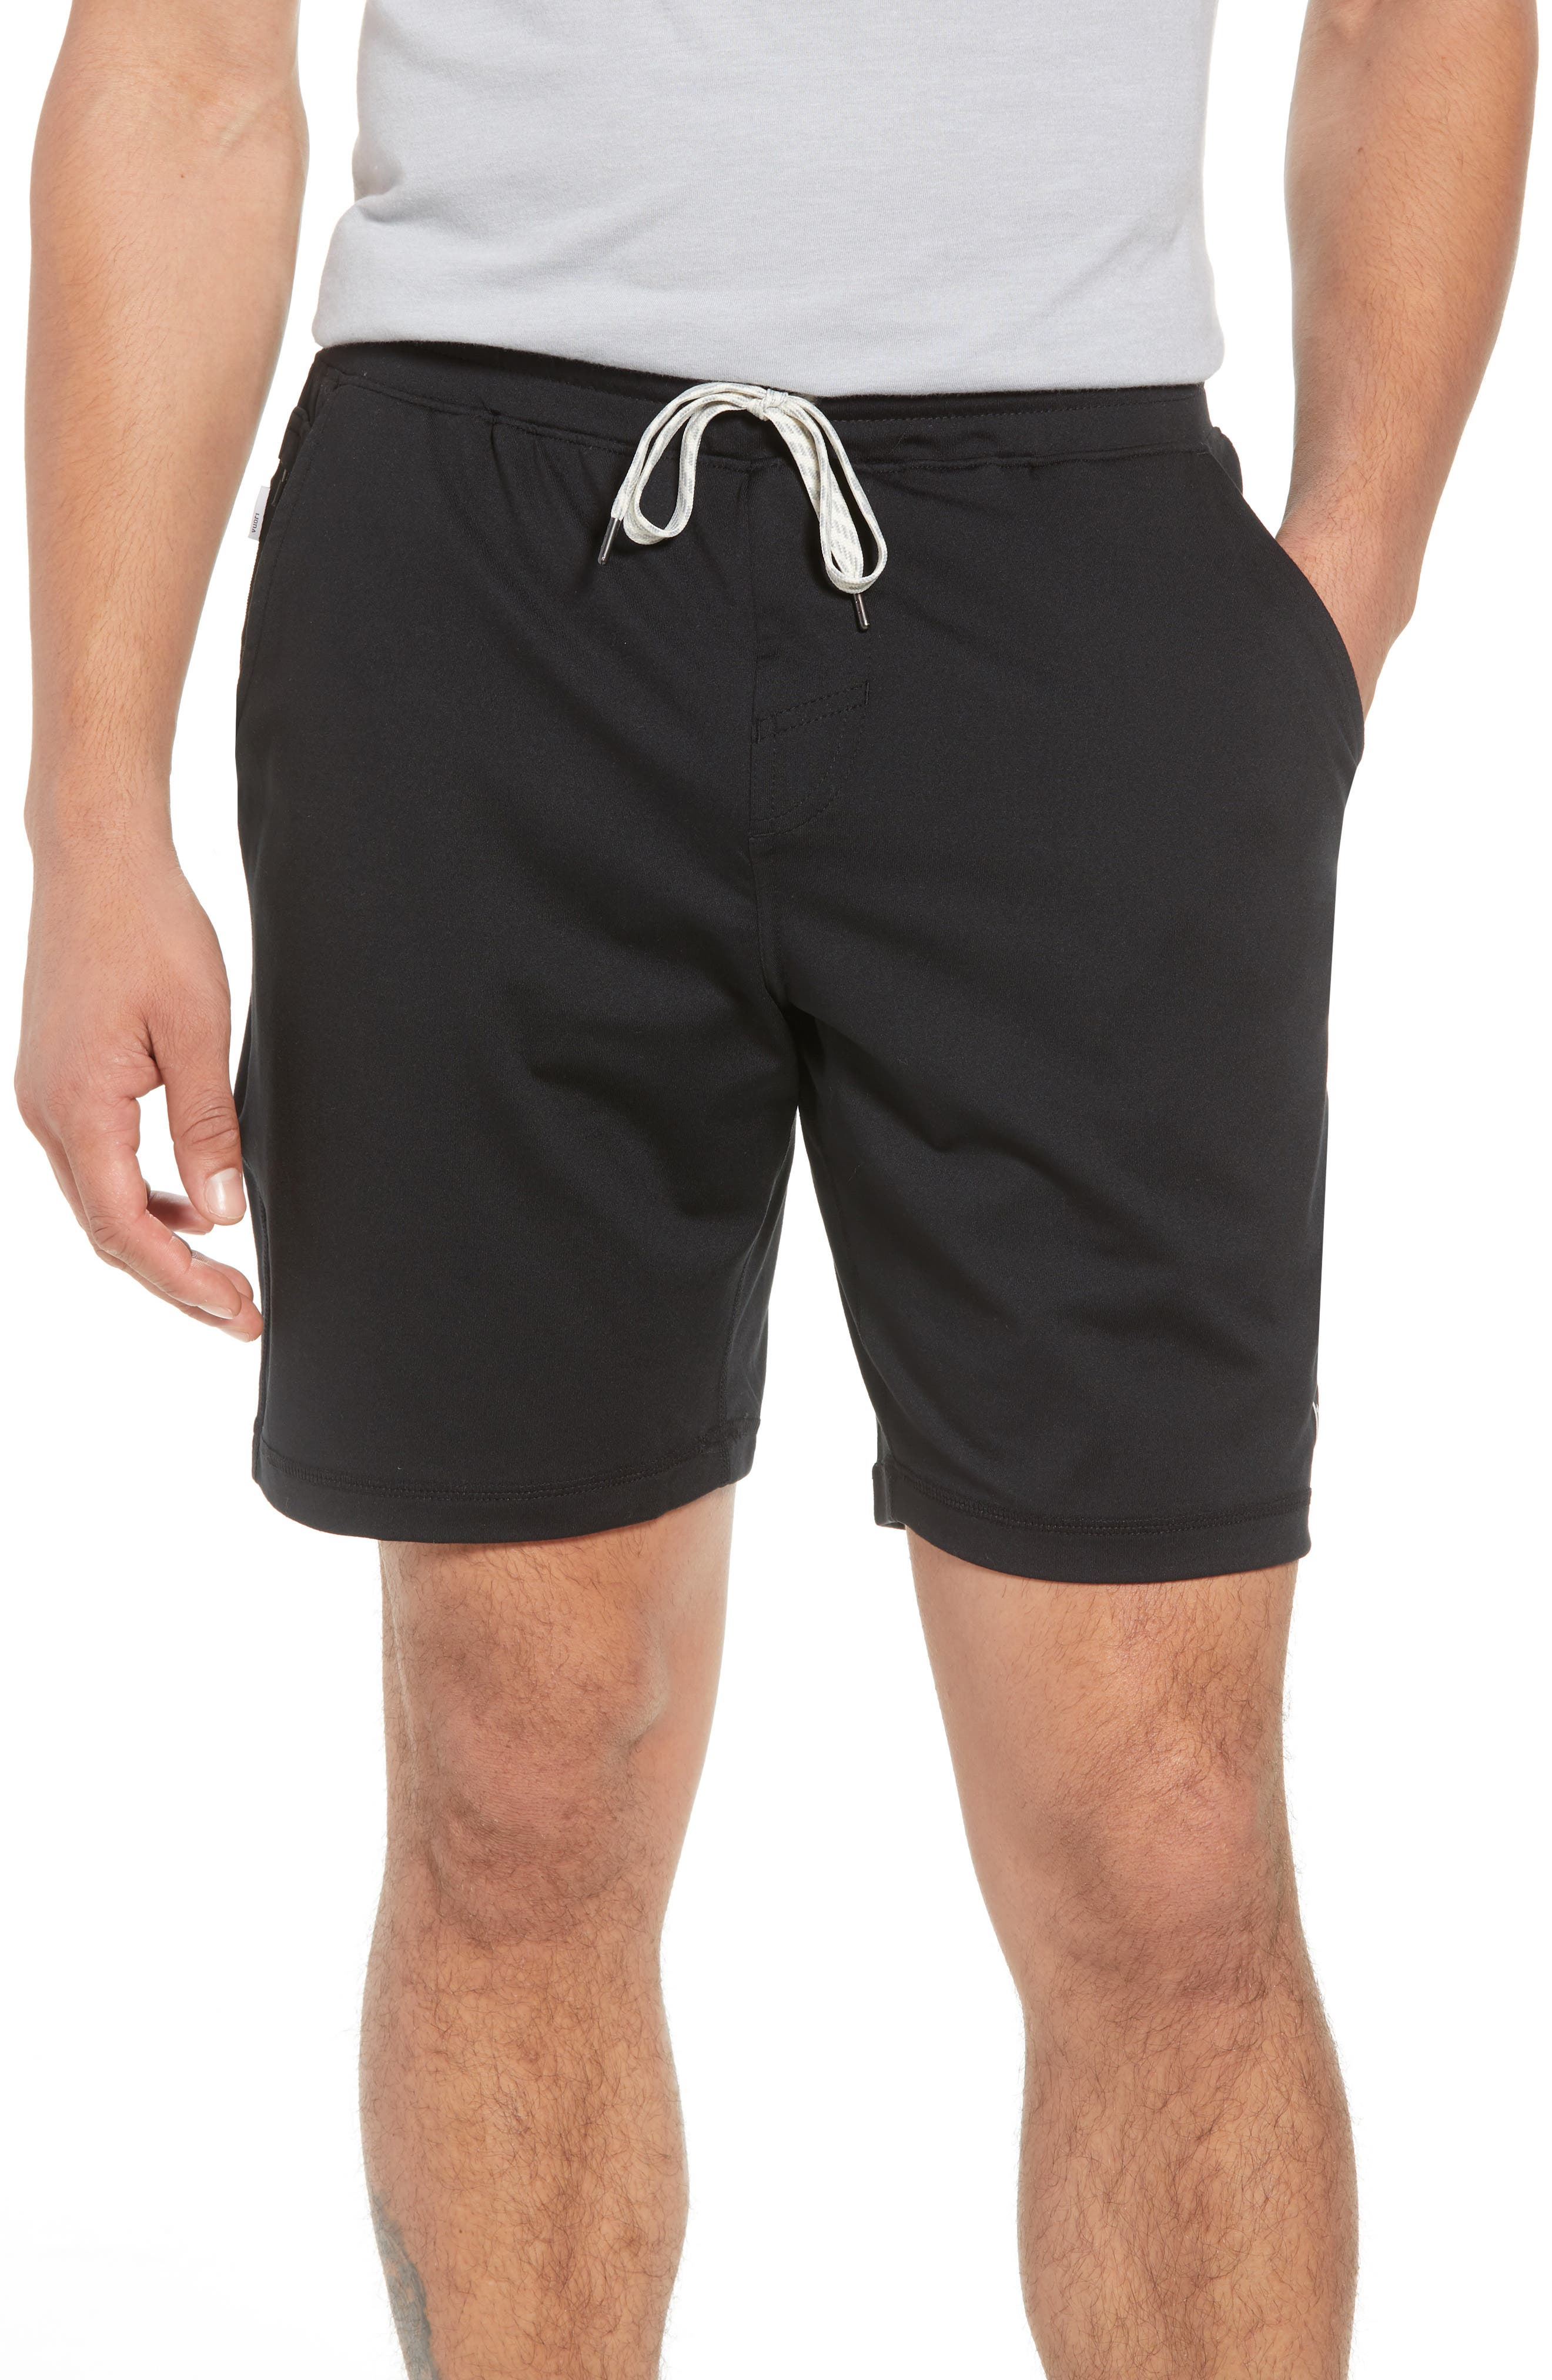 Ponto Shorts,                             Main thumbnail 1, color,                             Black